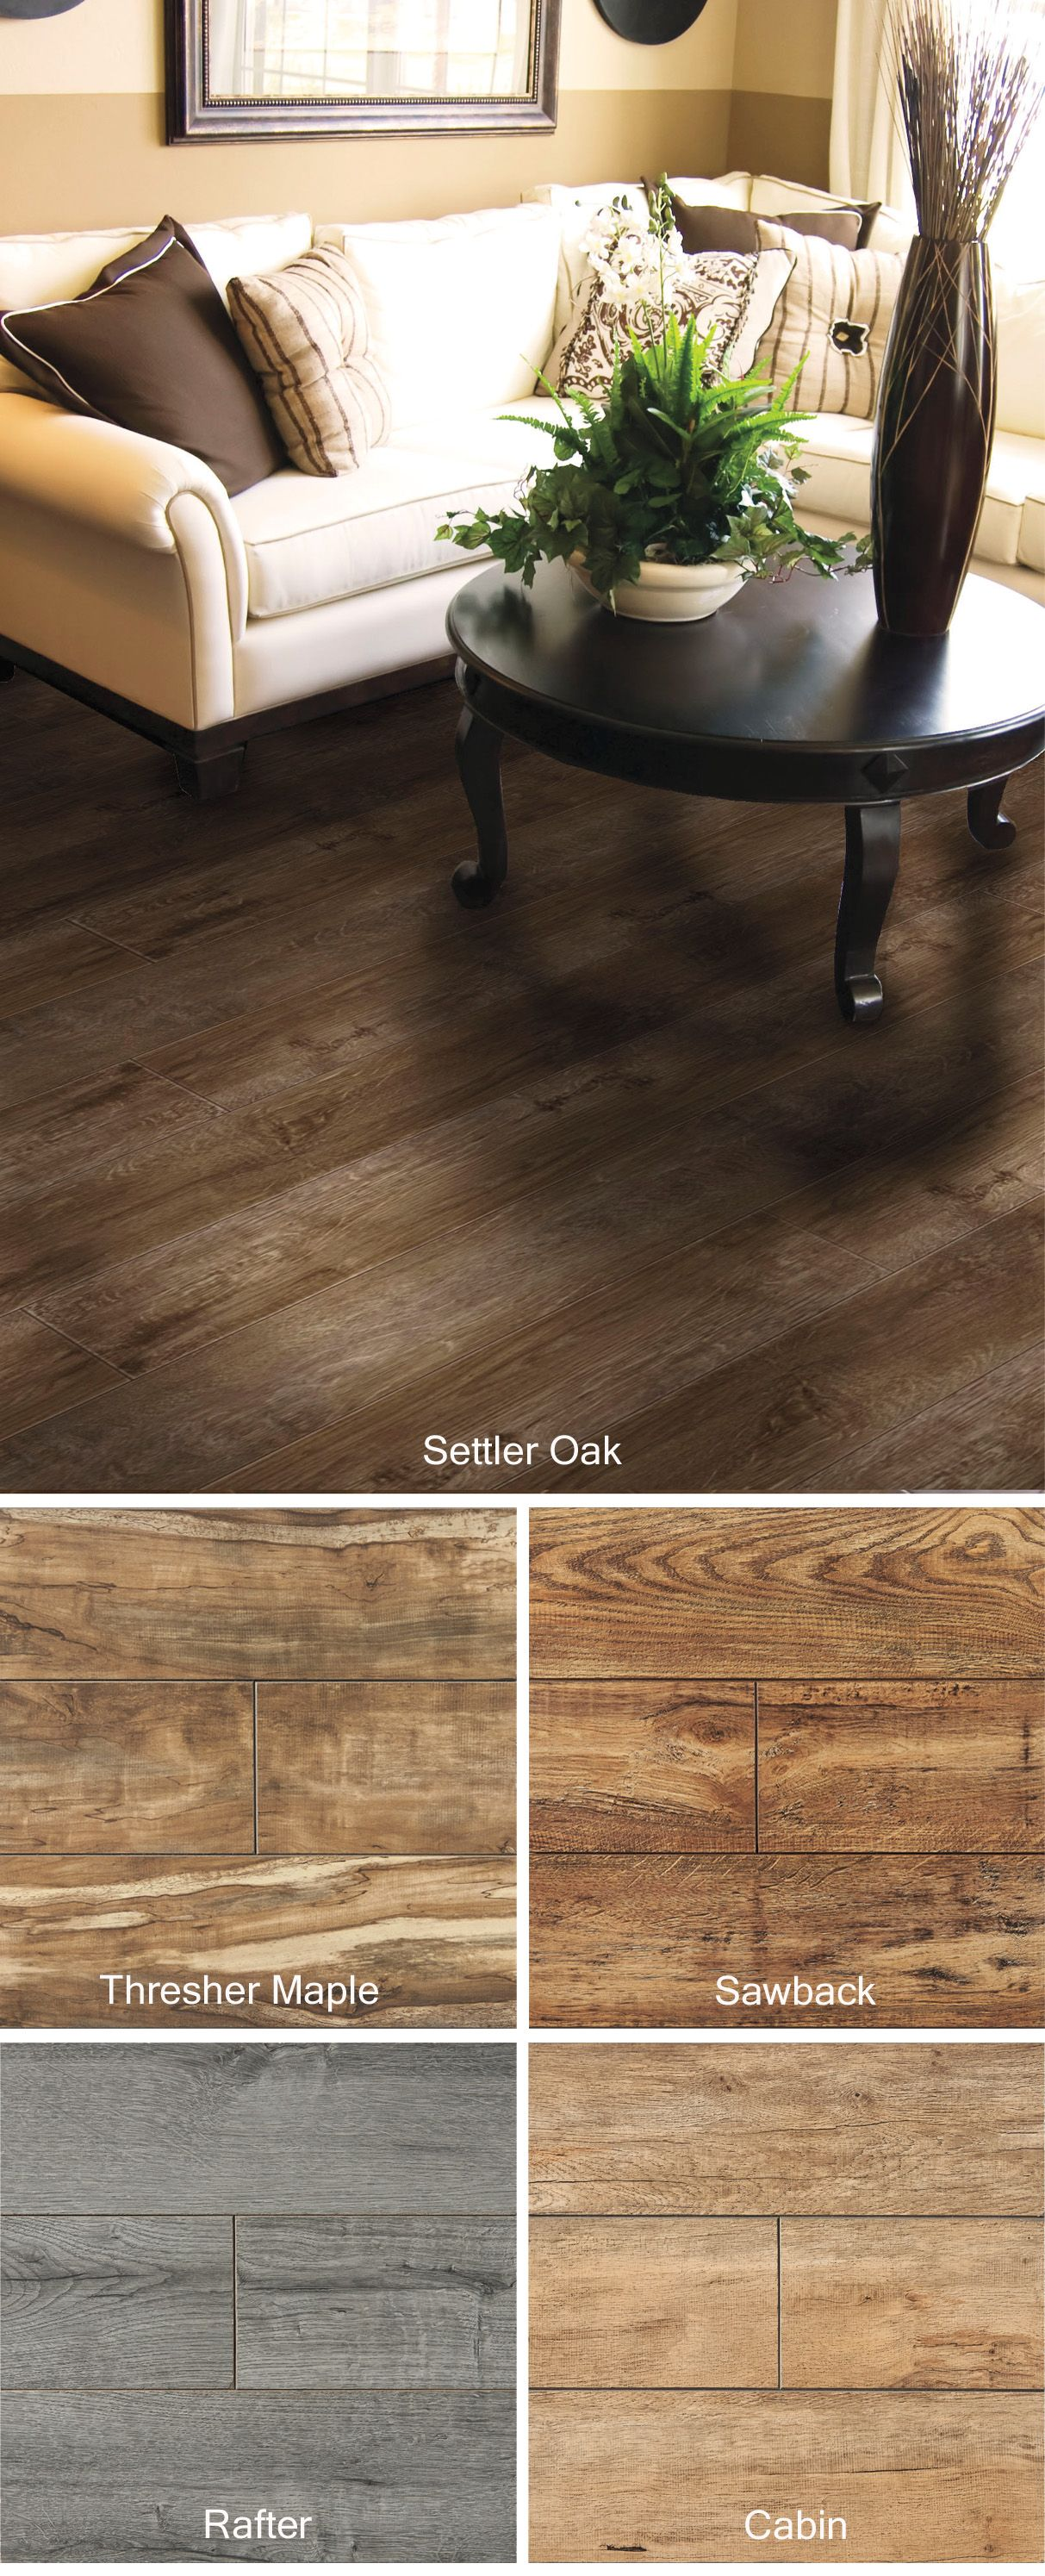 This Beautiful Heritage Settler Oak Laminate Flooring Is Natural